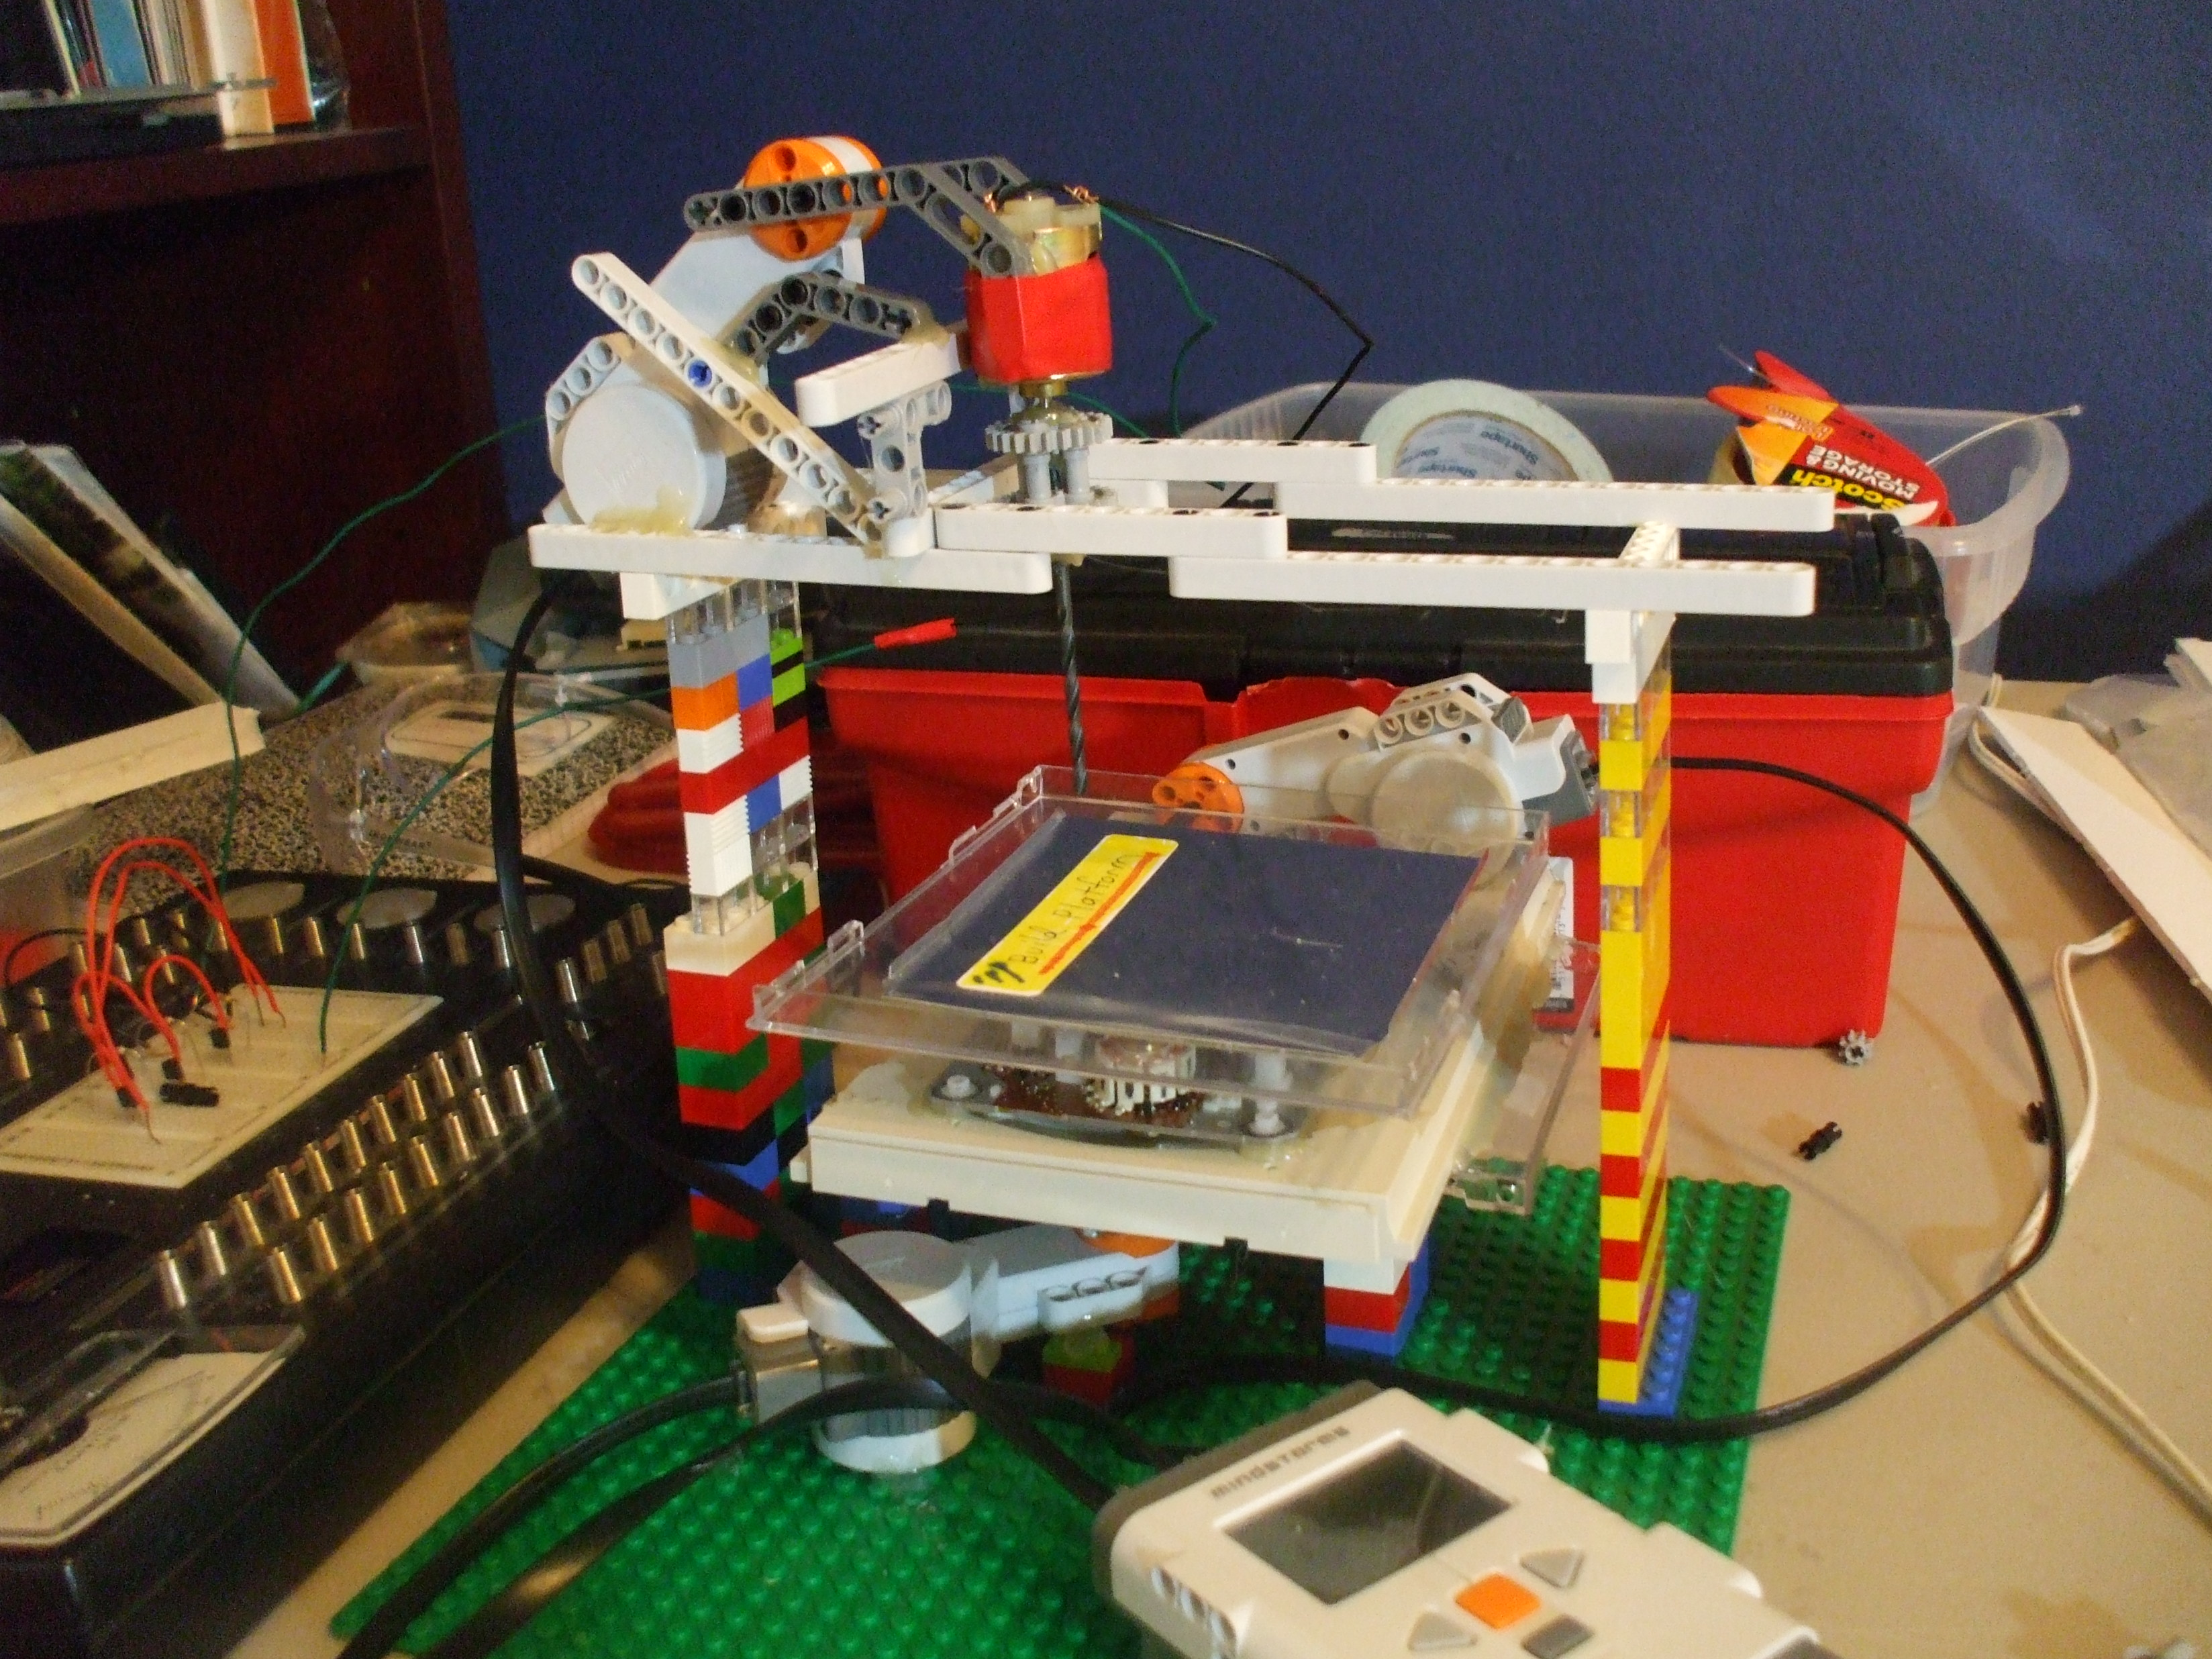 Lego CNC/Laser Cutter